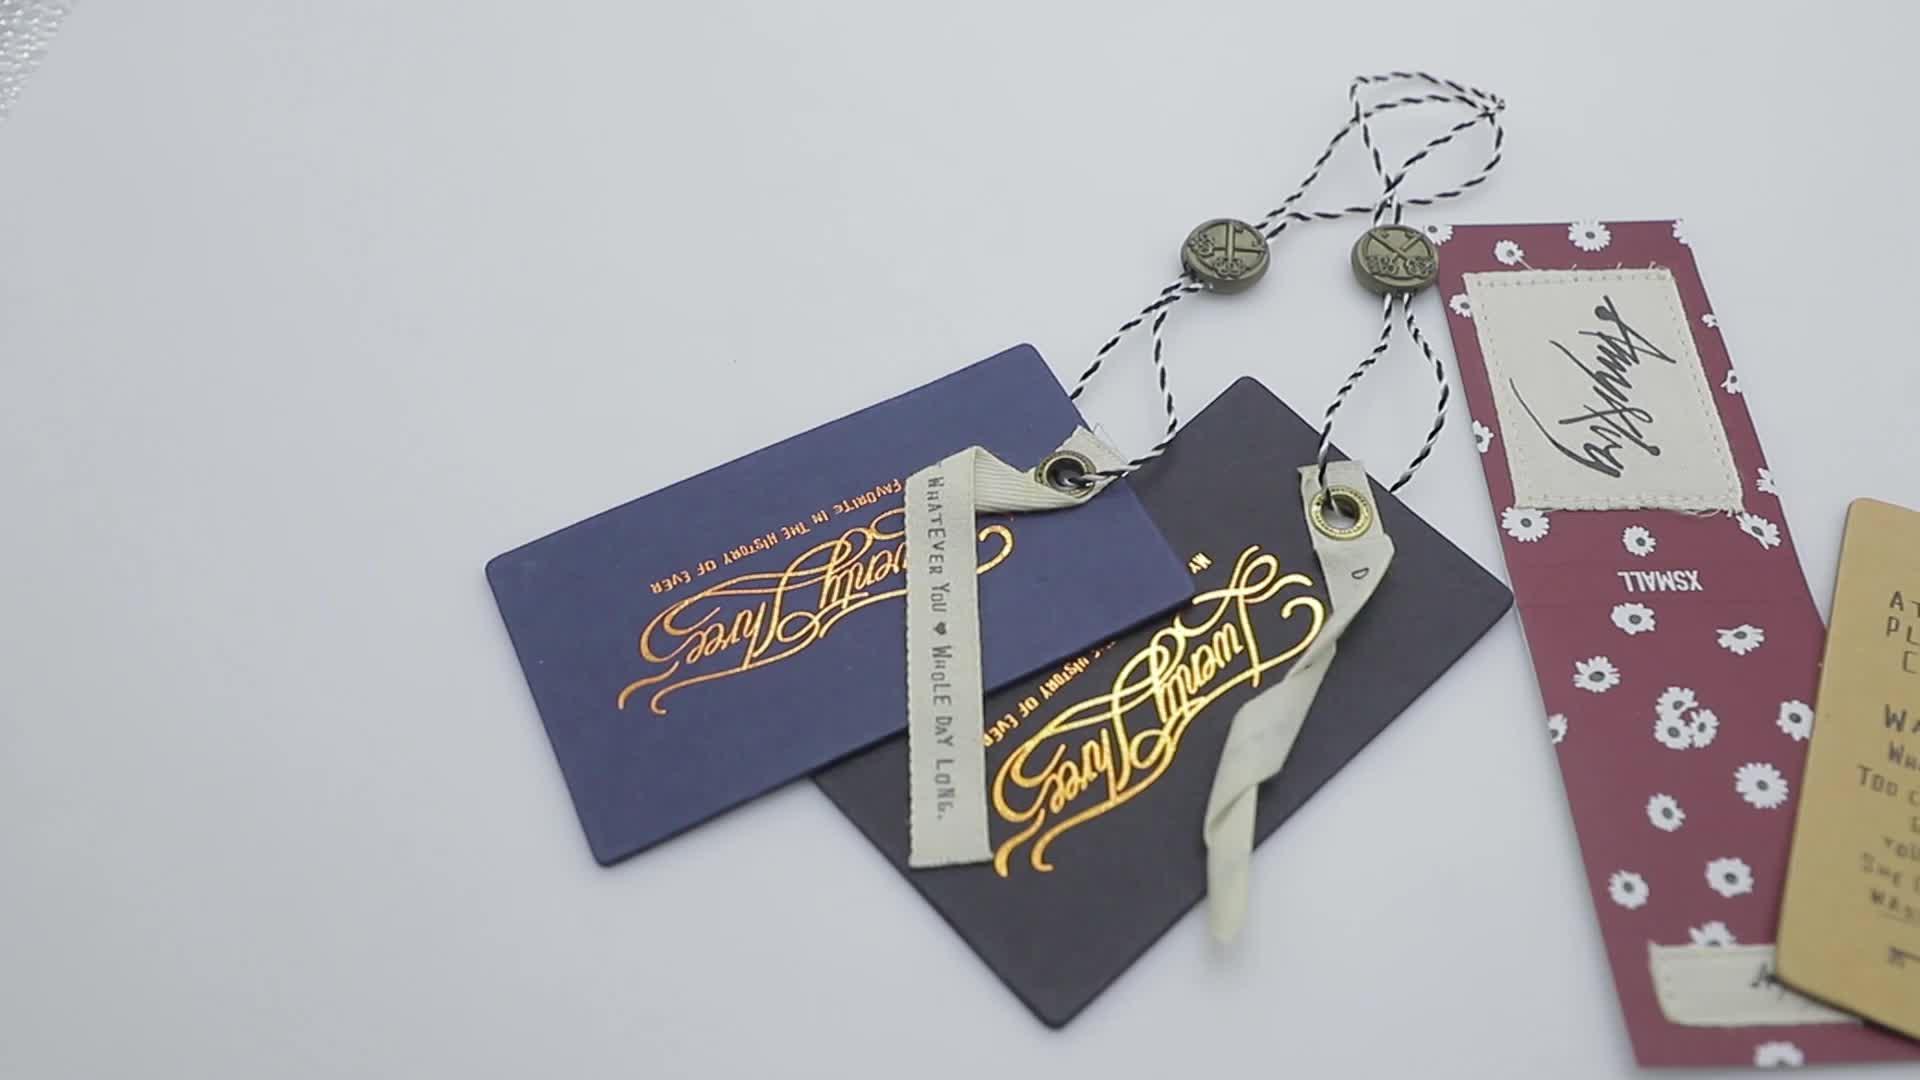 2018 Custom clothing tags / hang tag / garment hangtag